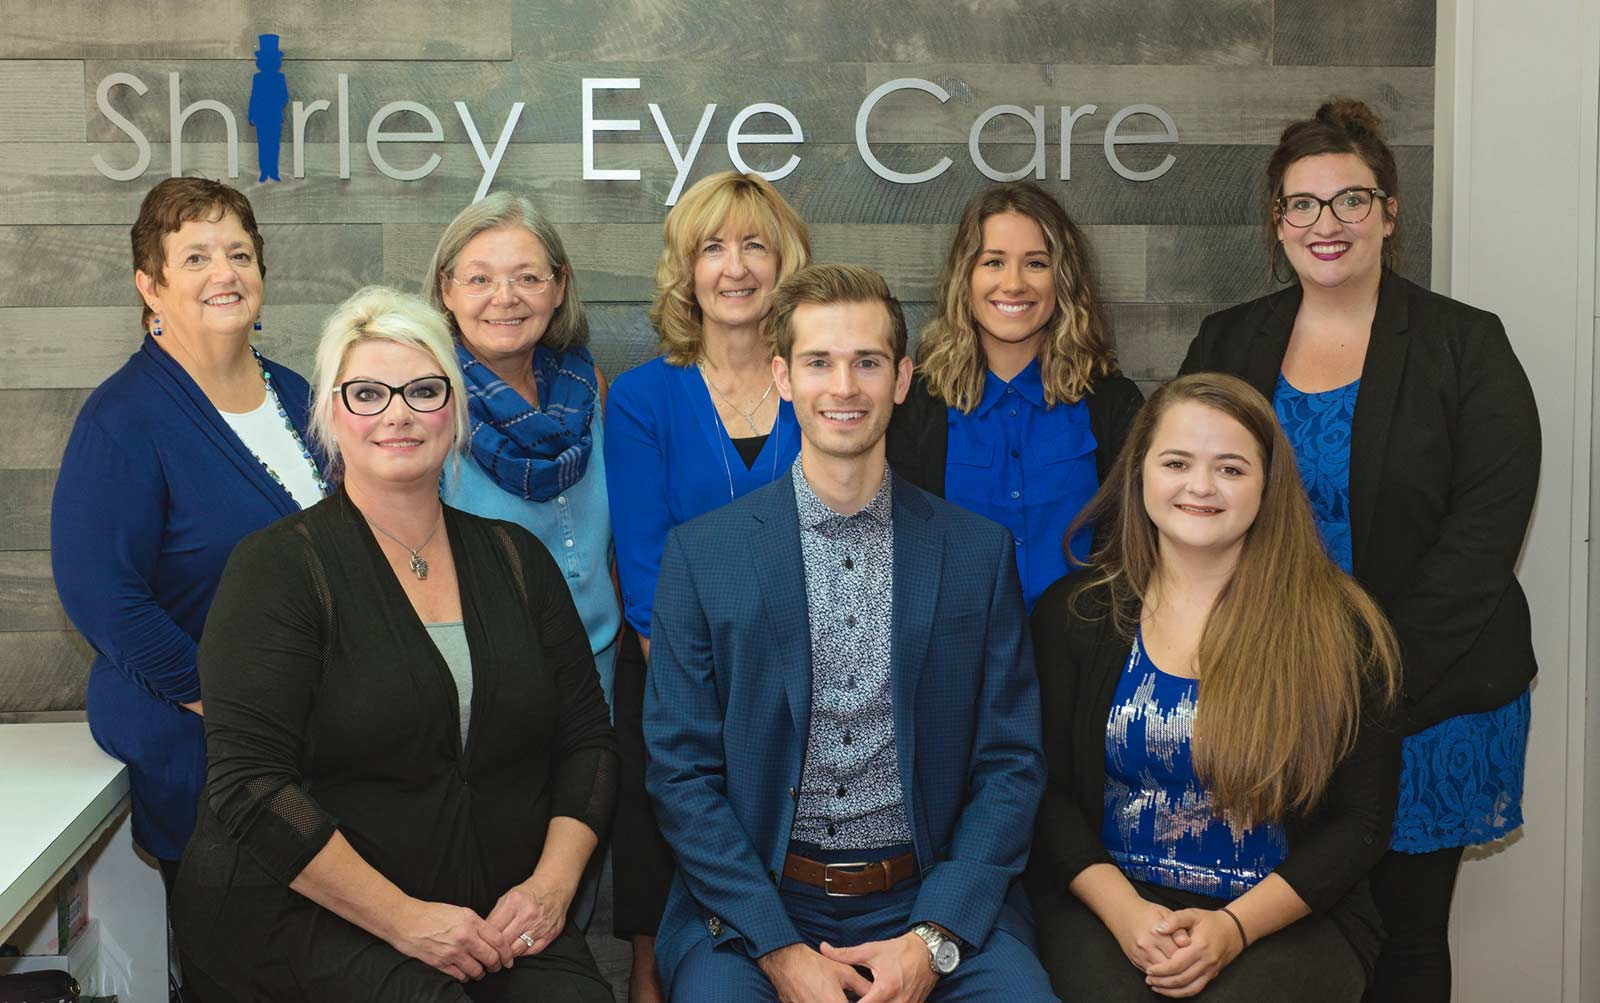 Sunglasses at Shirley Eye Care in Indiana, Pennsylvania